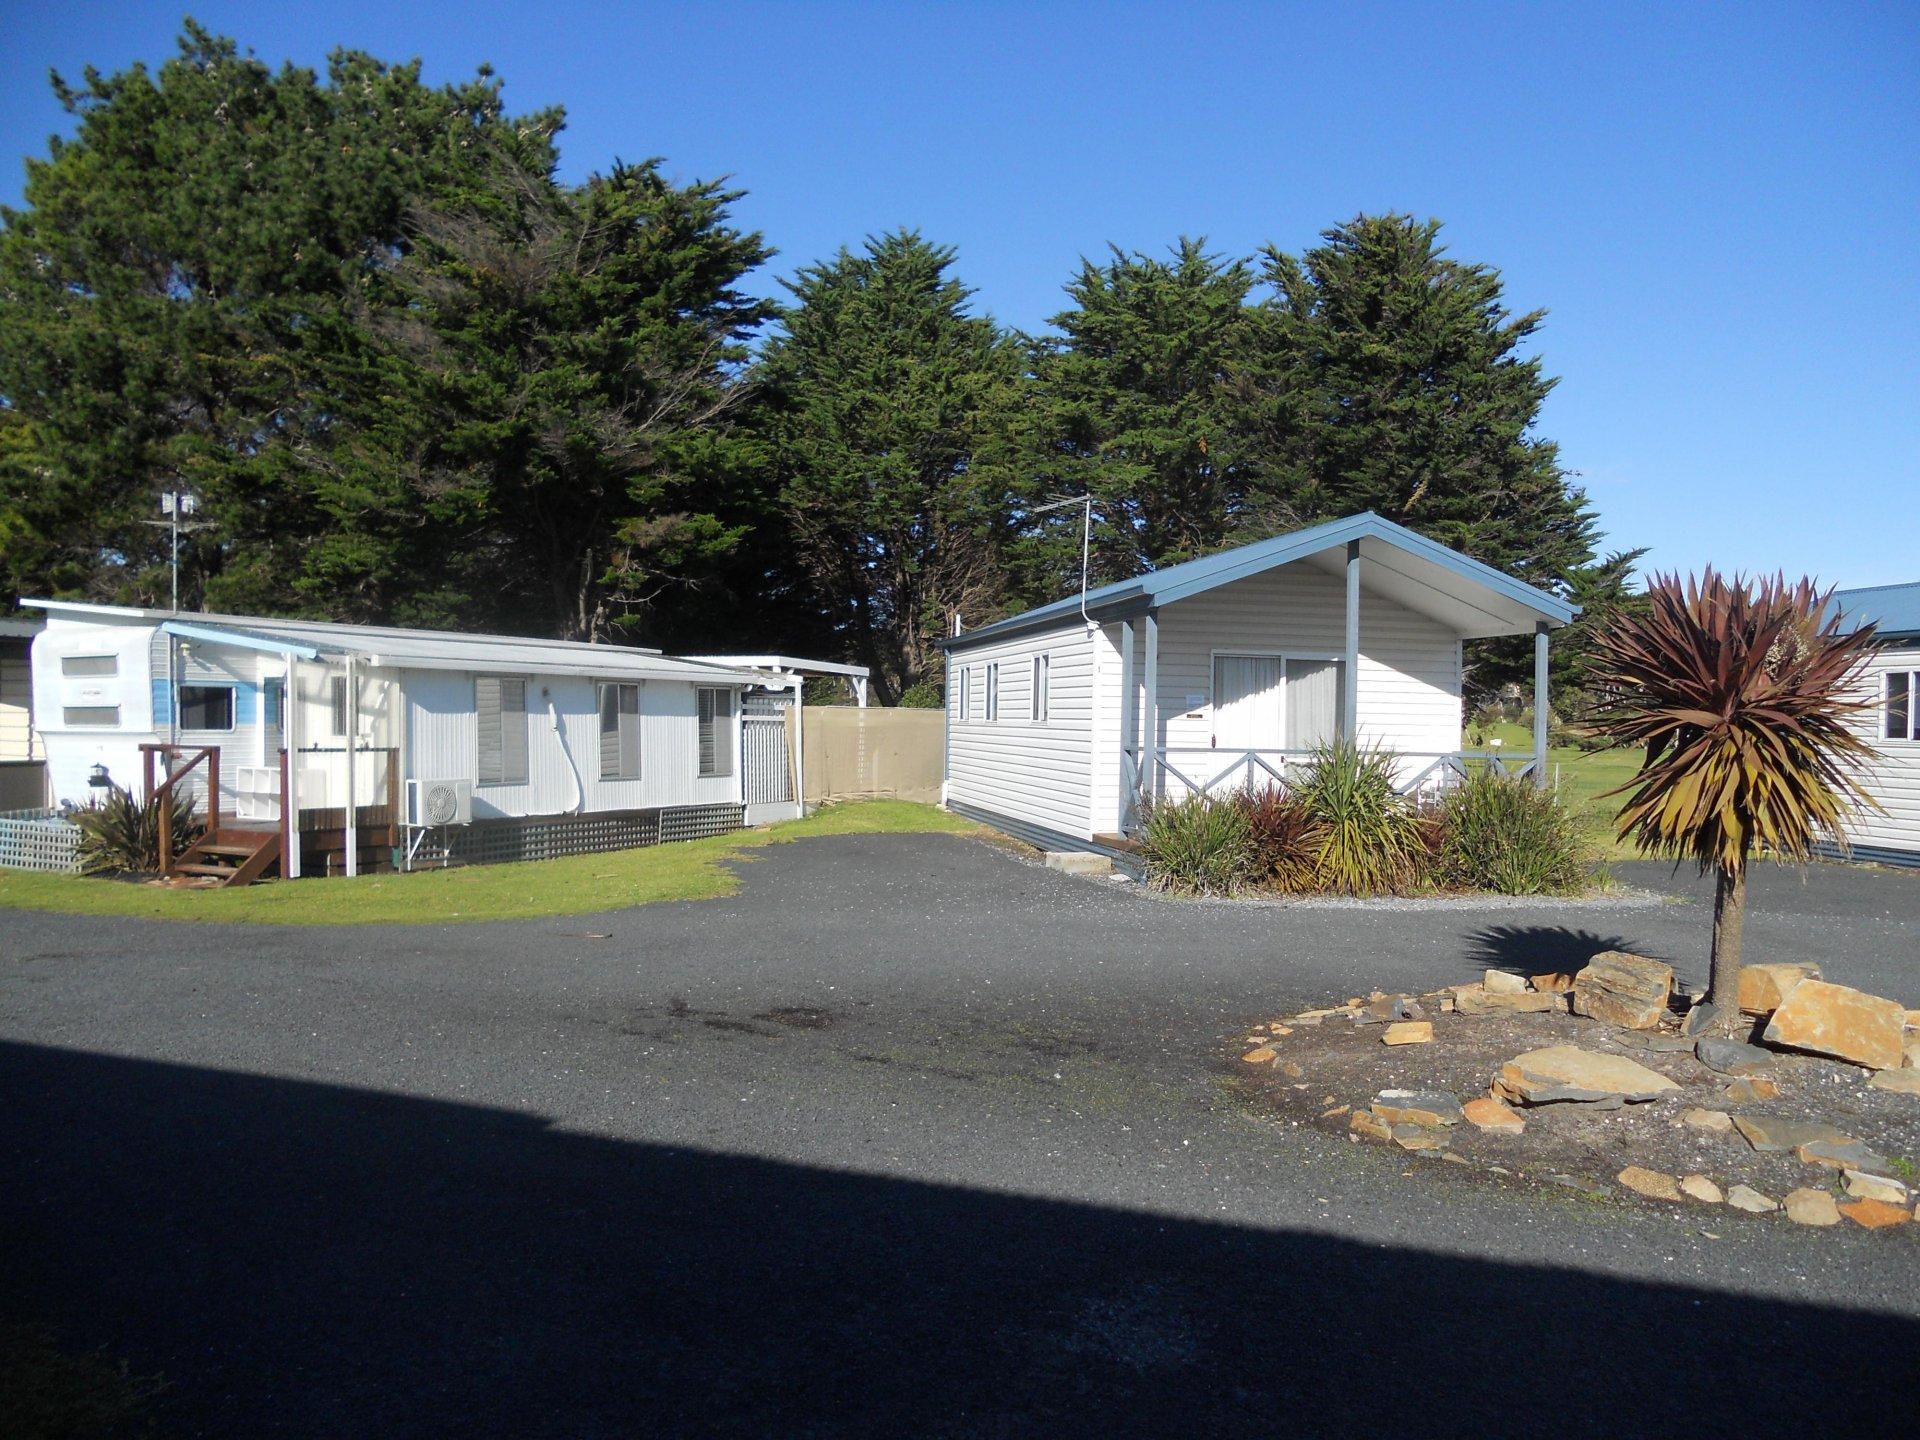 Best Value Tasmanian L/H Caravan Park O/O $495,000,4 f/hold cabins, average 2 yr